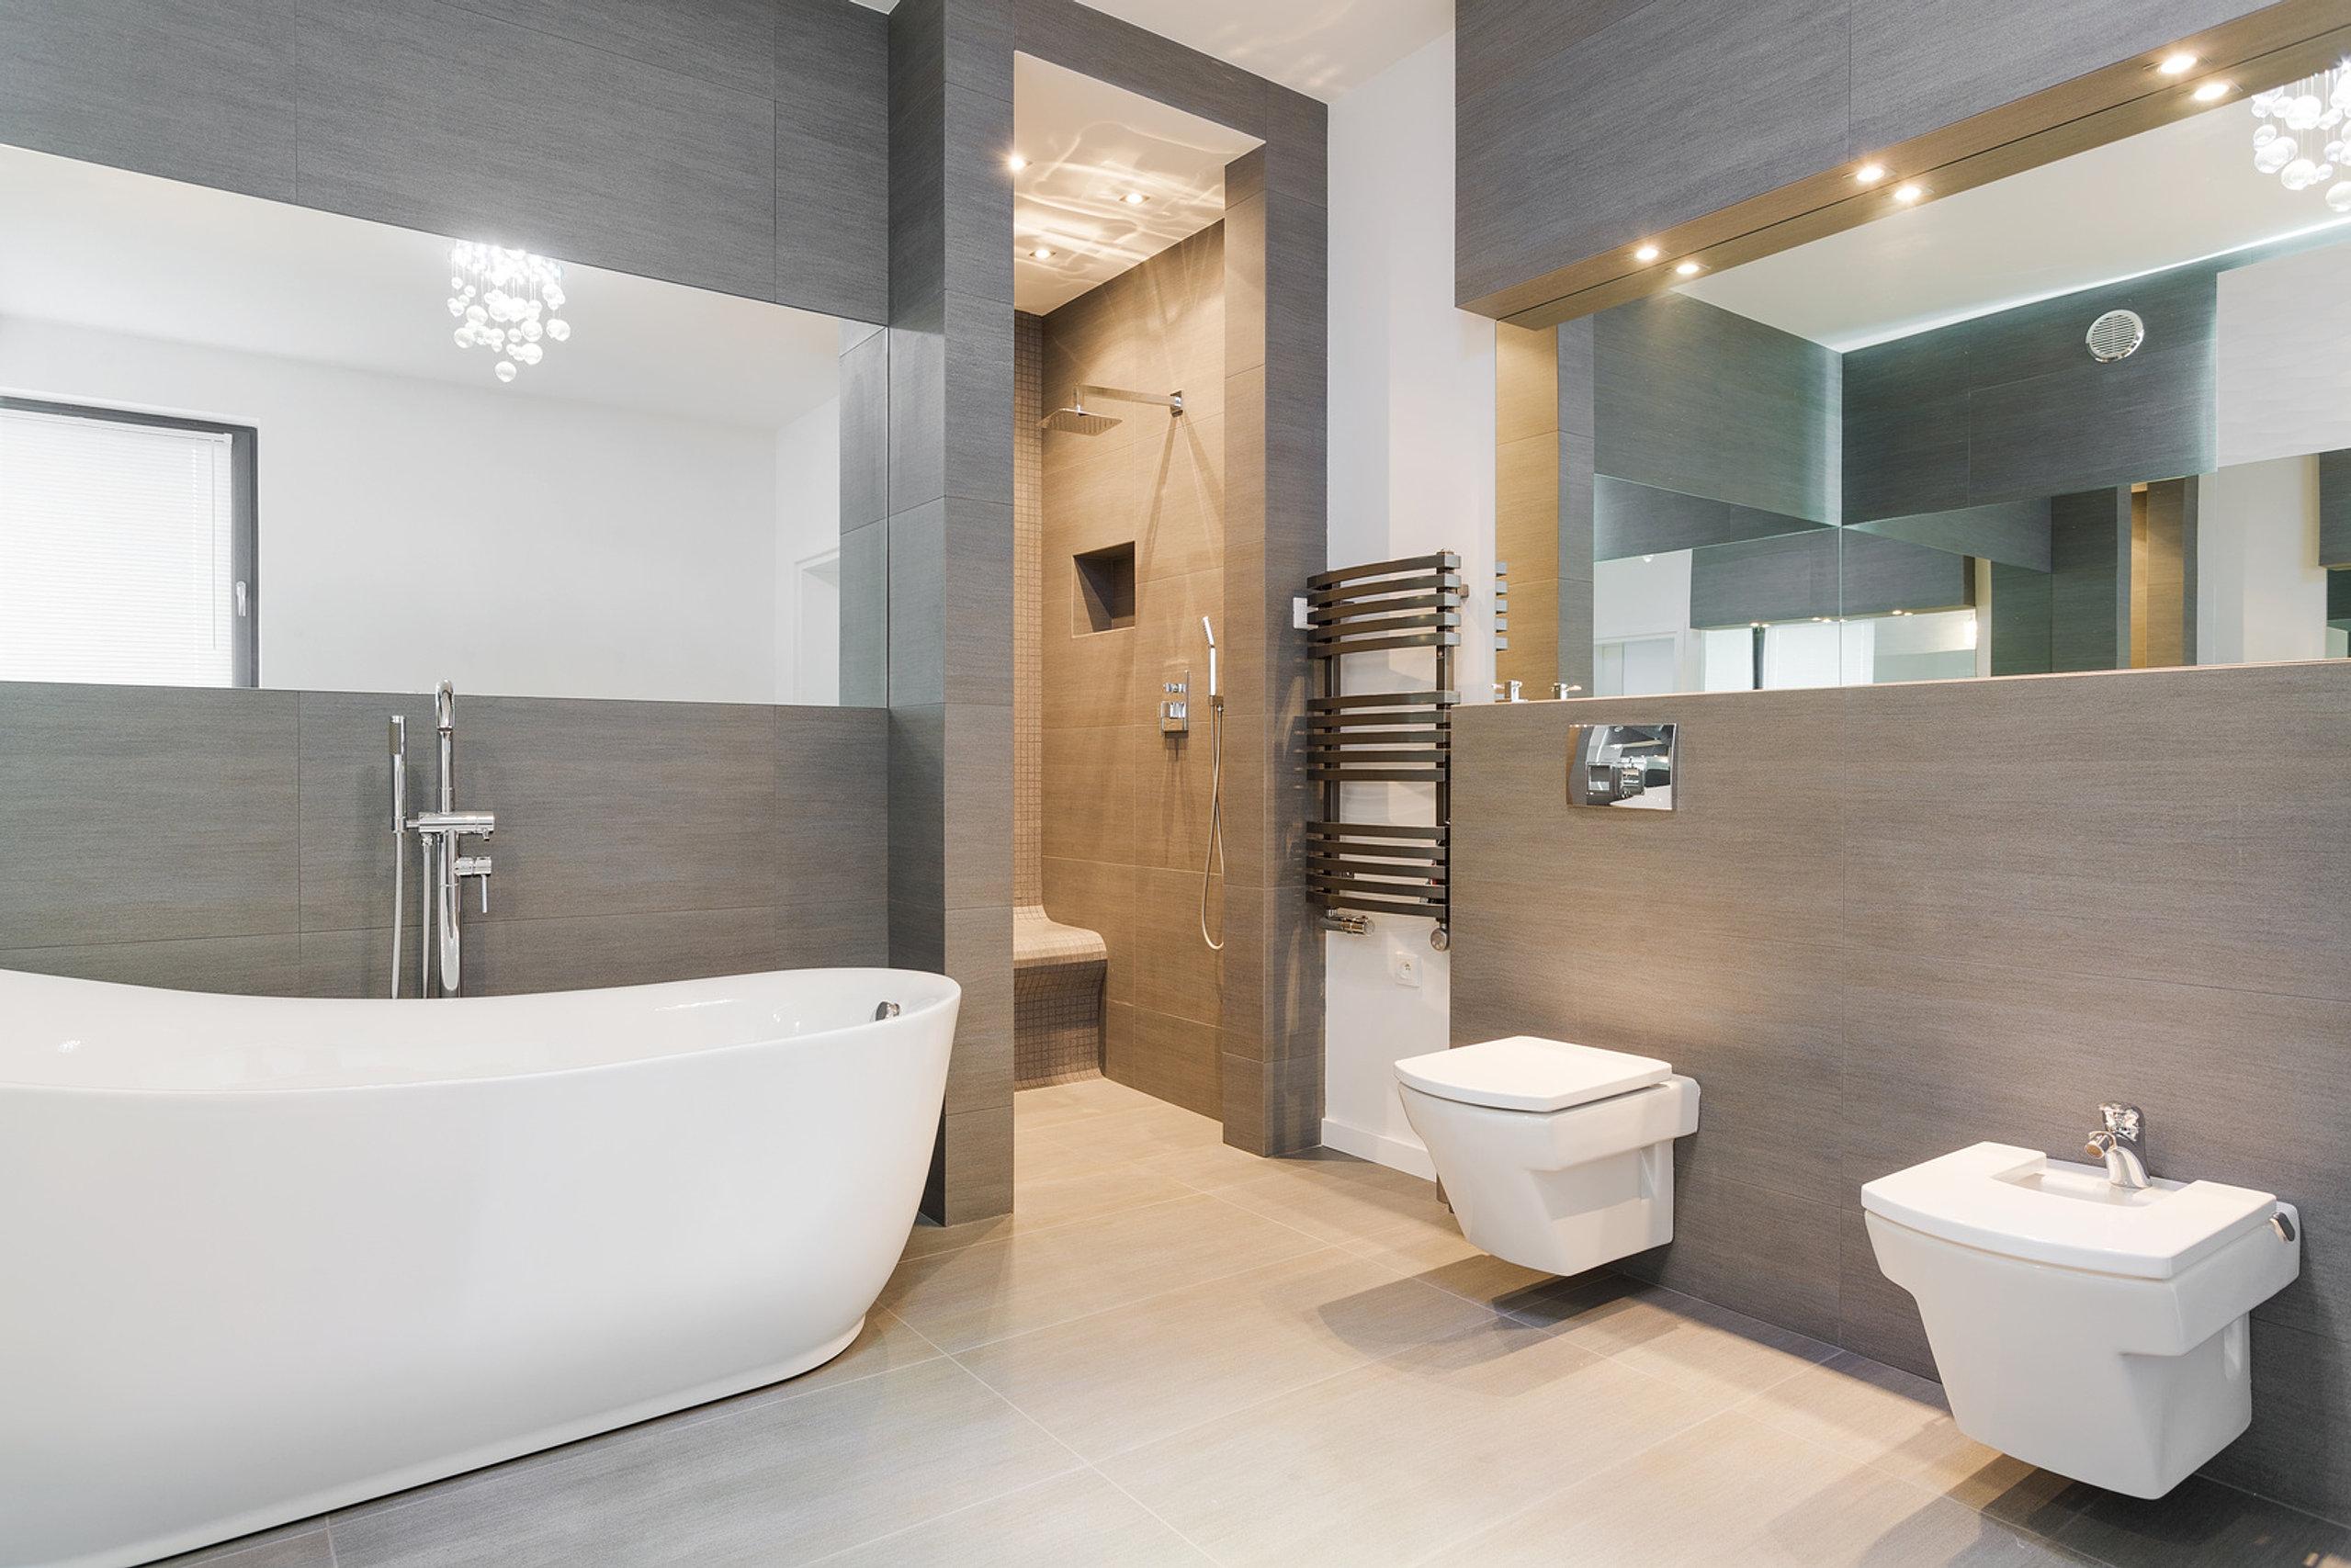 badezimmer sanieren | jtleigh - hausgestaltung ideen